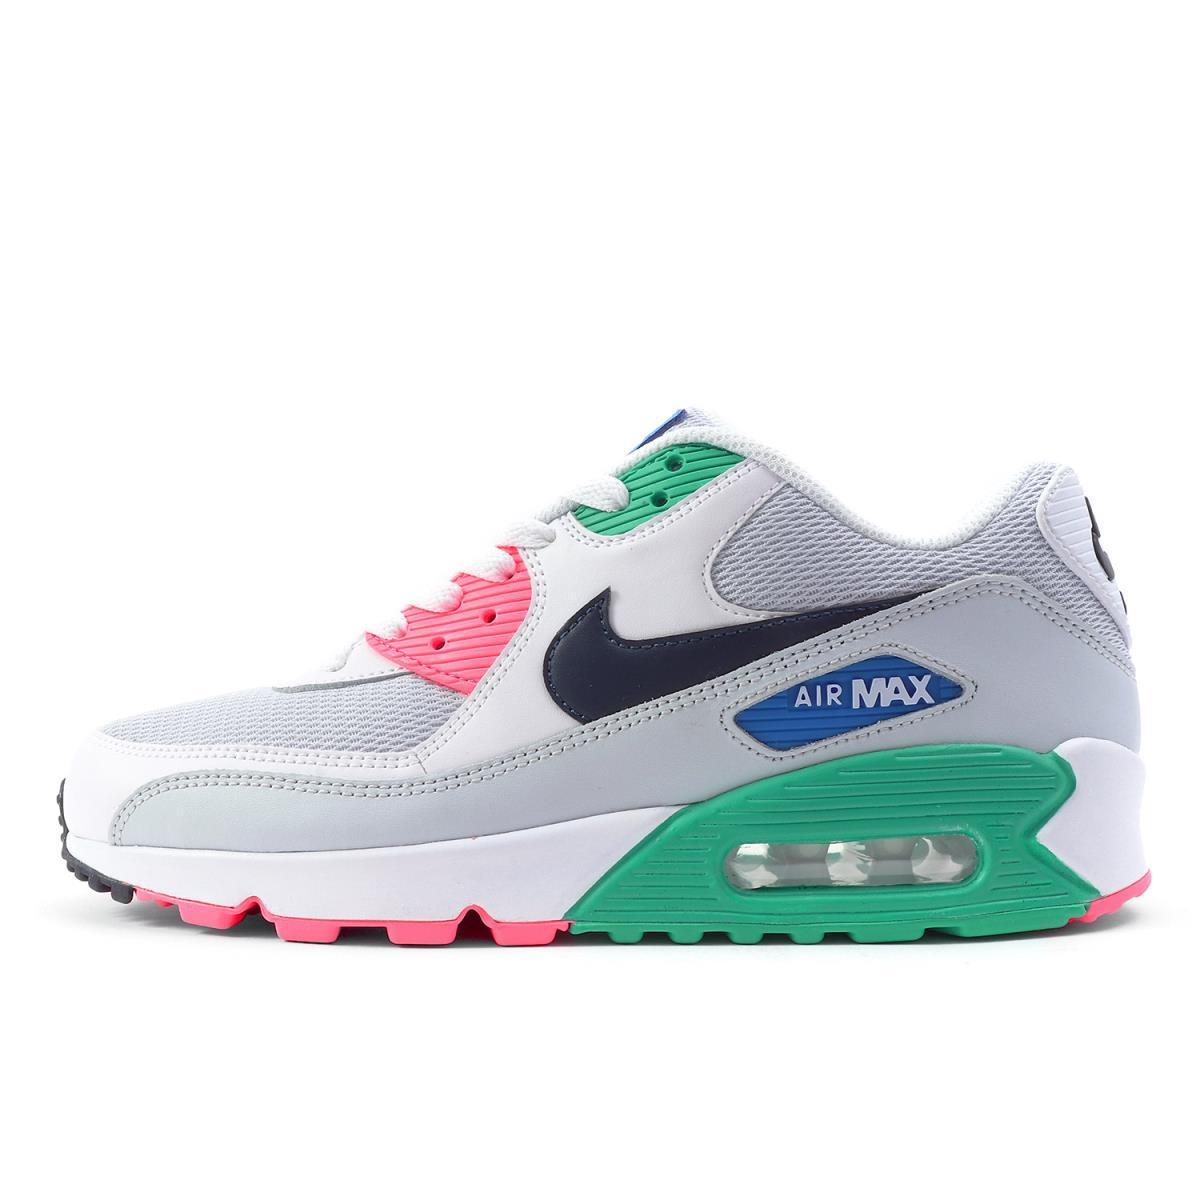 Nike Air Max 90 Essential (AJ1285 100)